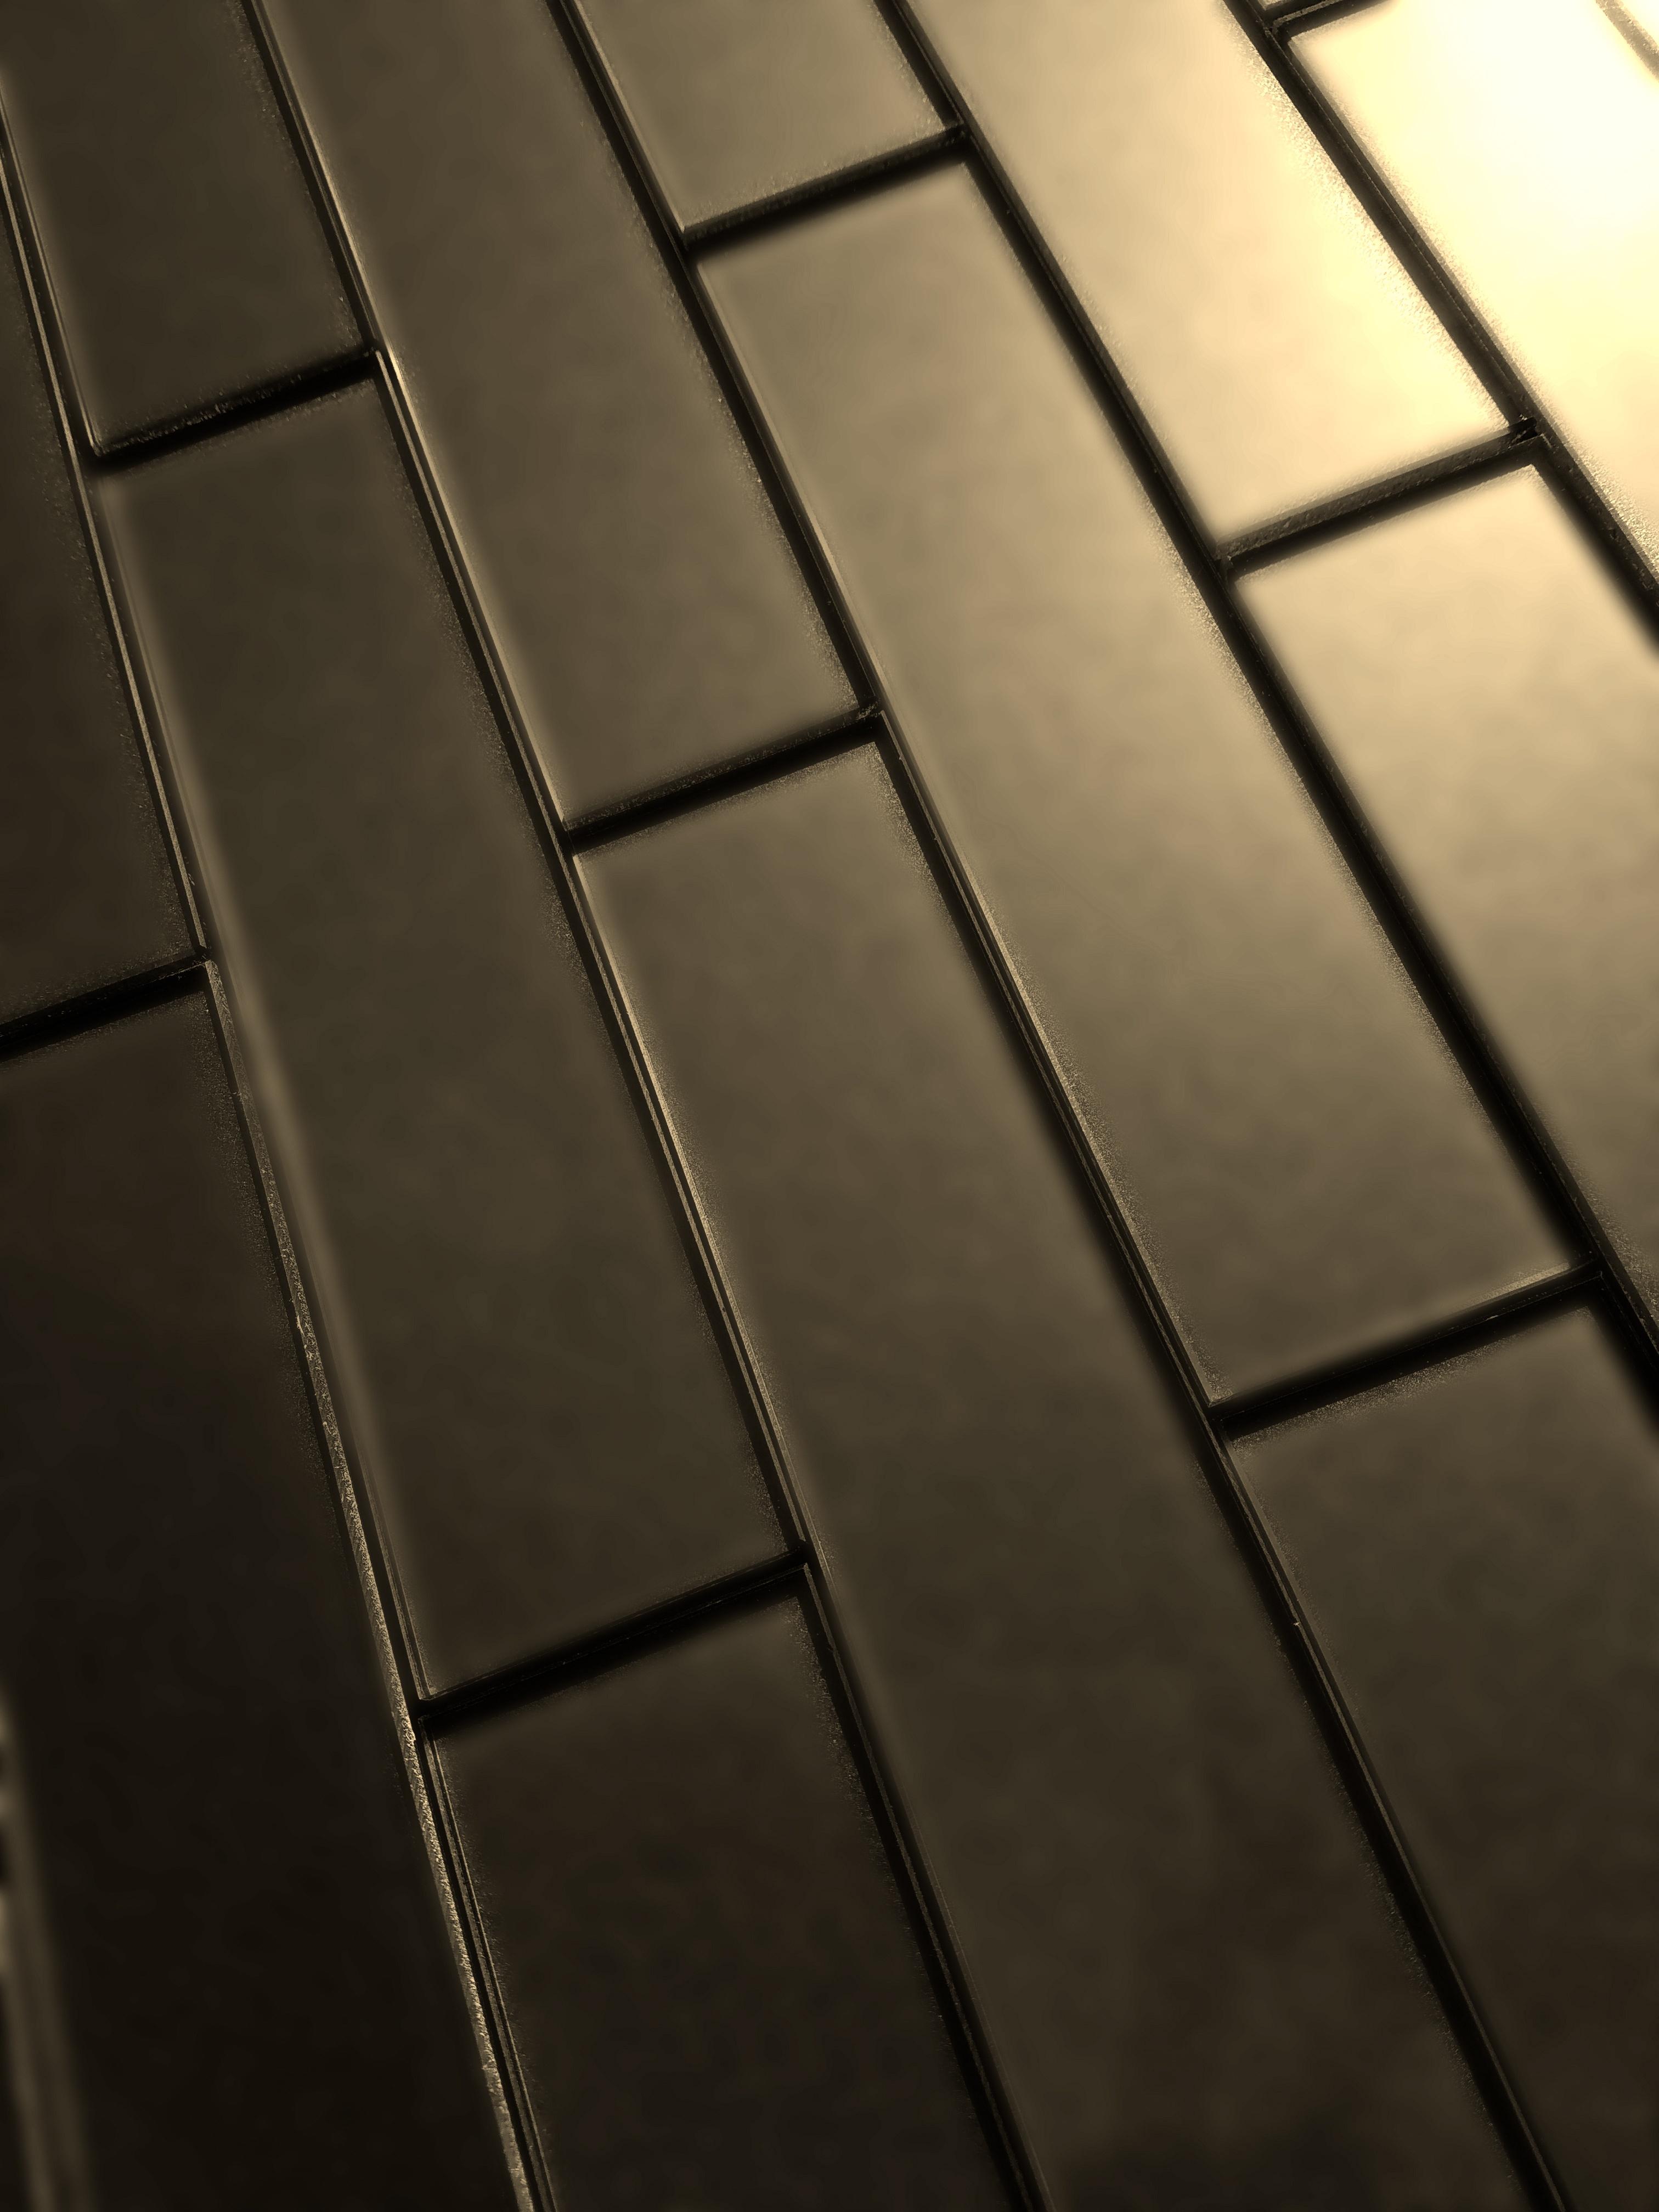 "Forever 2"" x 8"" Matte Straight Bronze Glass Loose Backsplash Wall Tile"